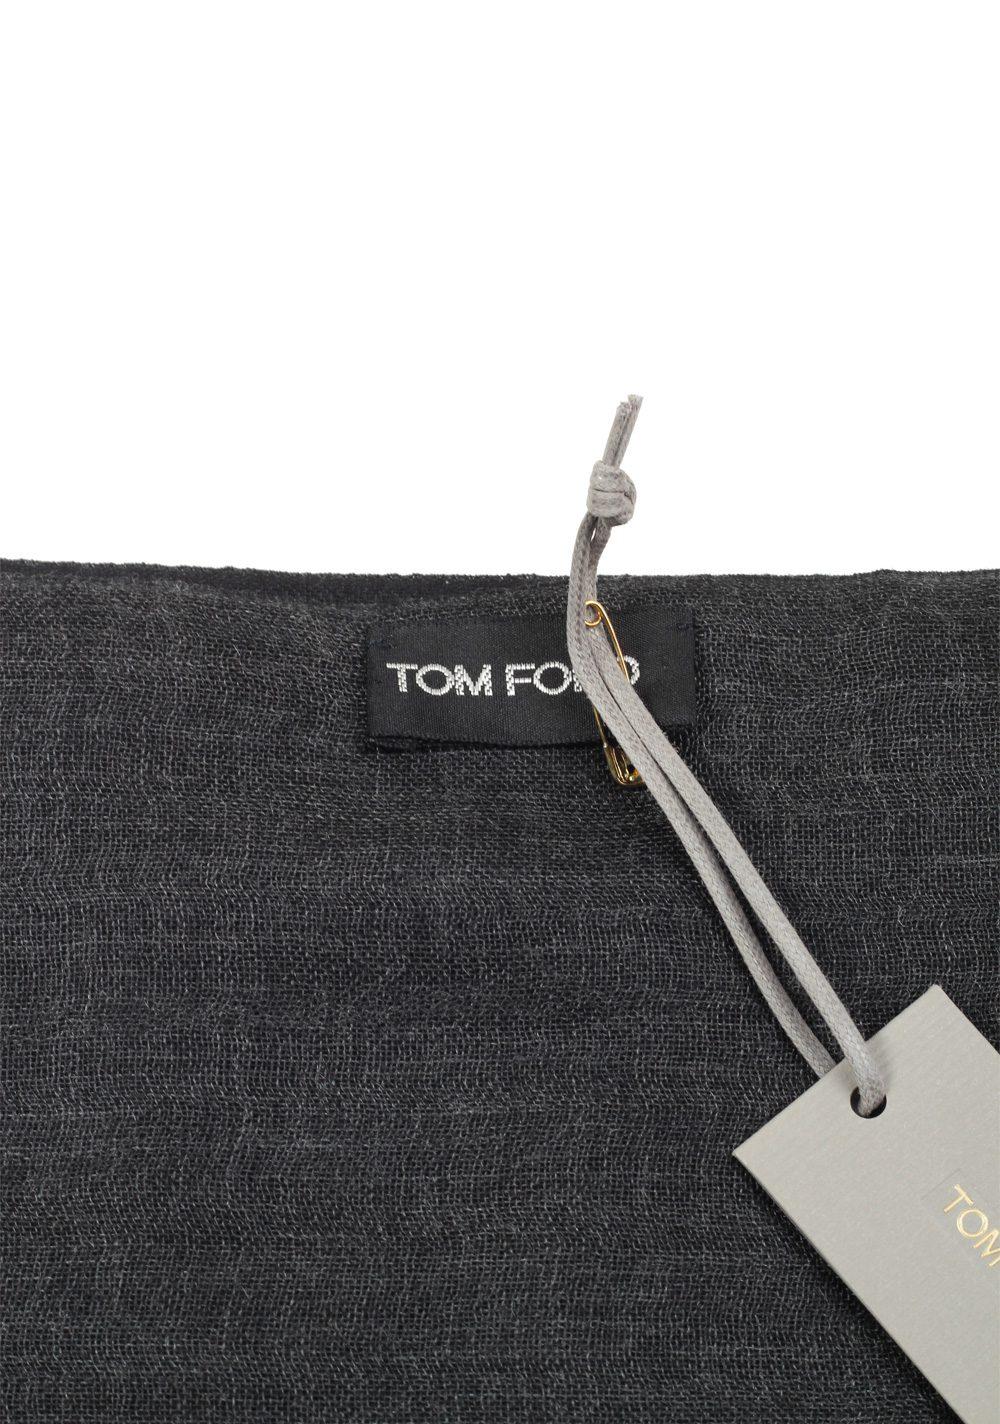 Tom Ford Black Cashmere Silk Signature Scarf 75″ / 24″ | Costume Limité